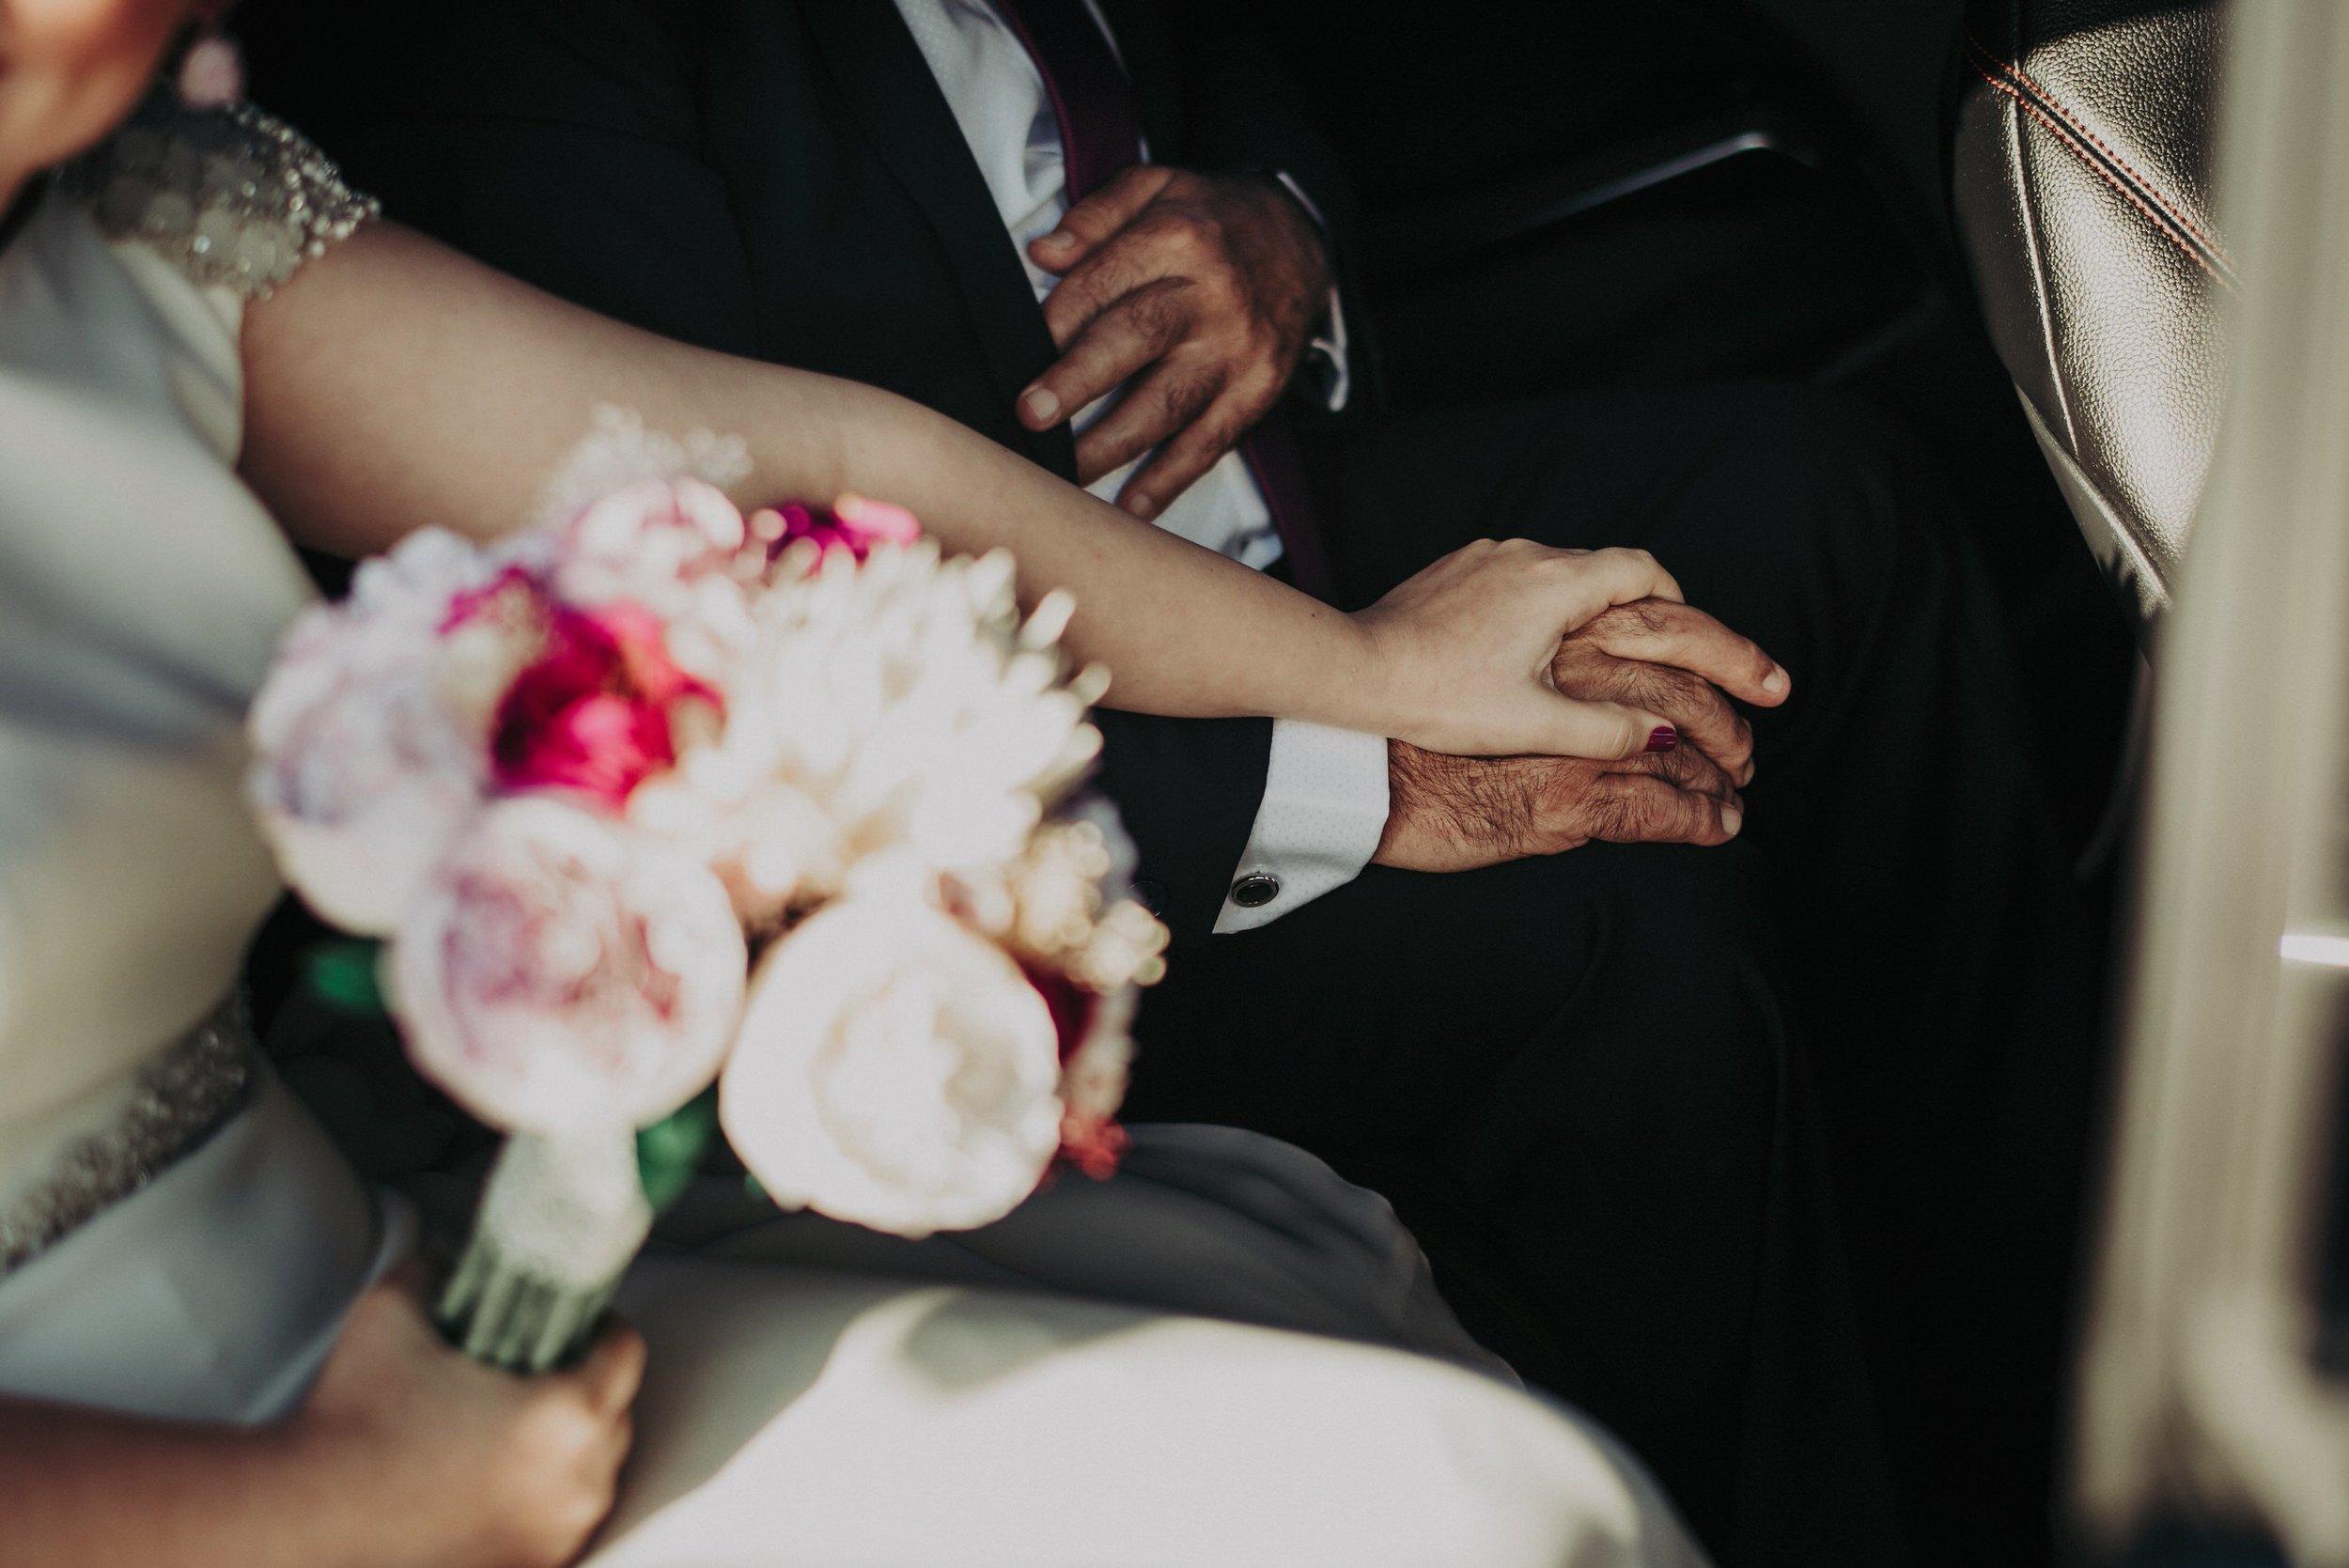 Laura & Rubén - boda en utrera - Santa clotilde- Manolo mayo - Fotografo de boda - Andrés Amarillo AAA_1075-Exposure (73).jpg